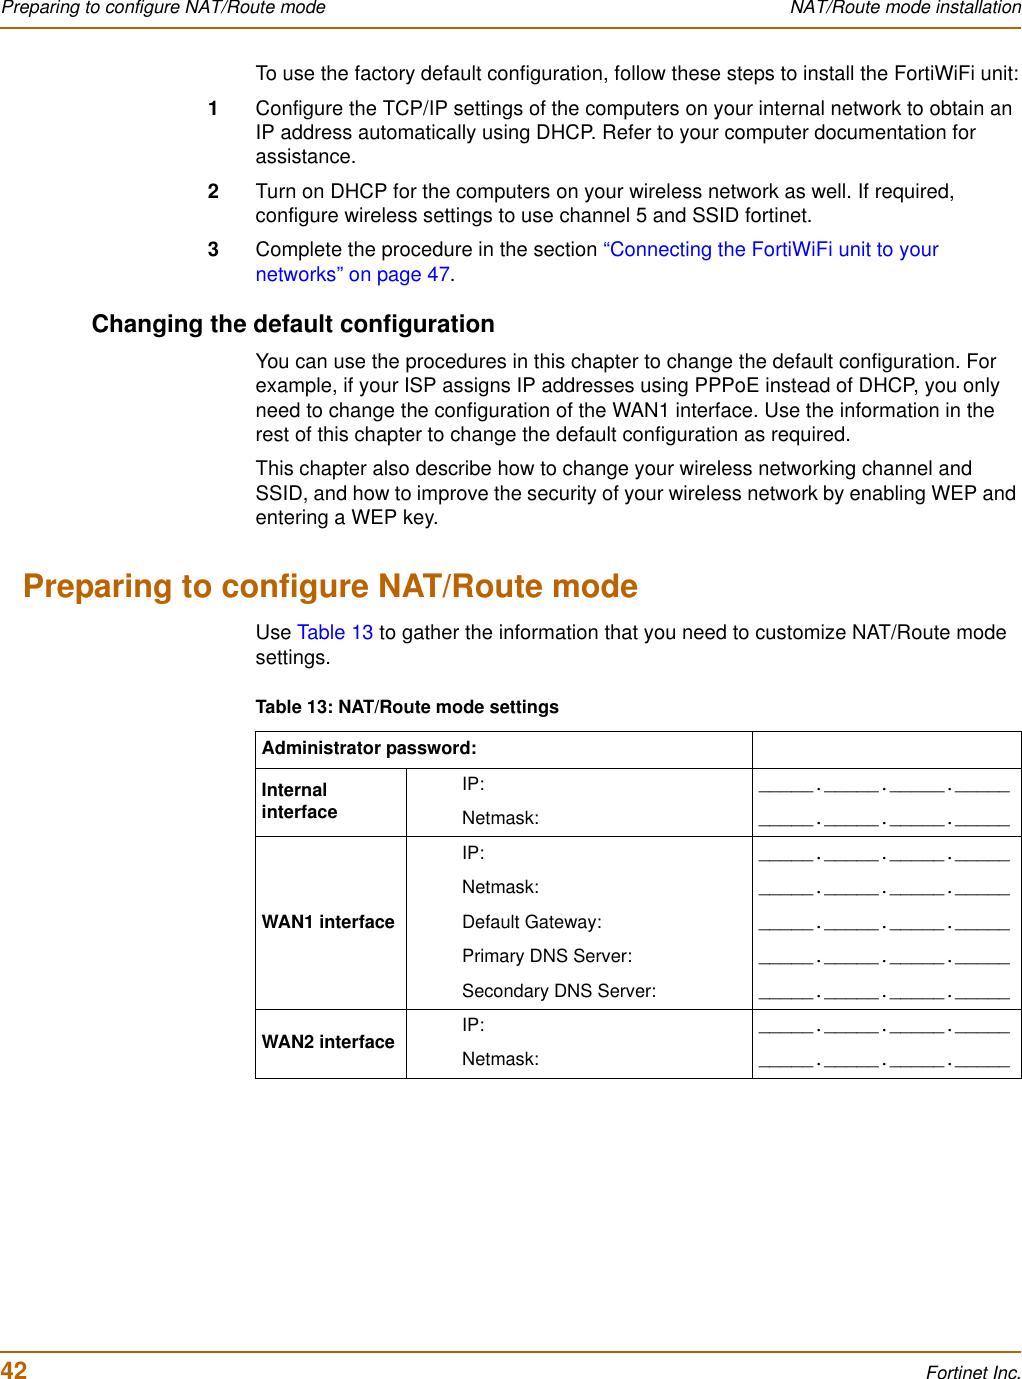 fortigate 80c firewall configuration guide pdf